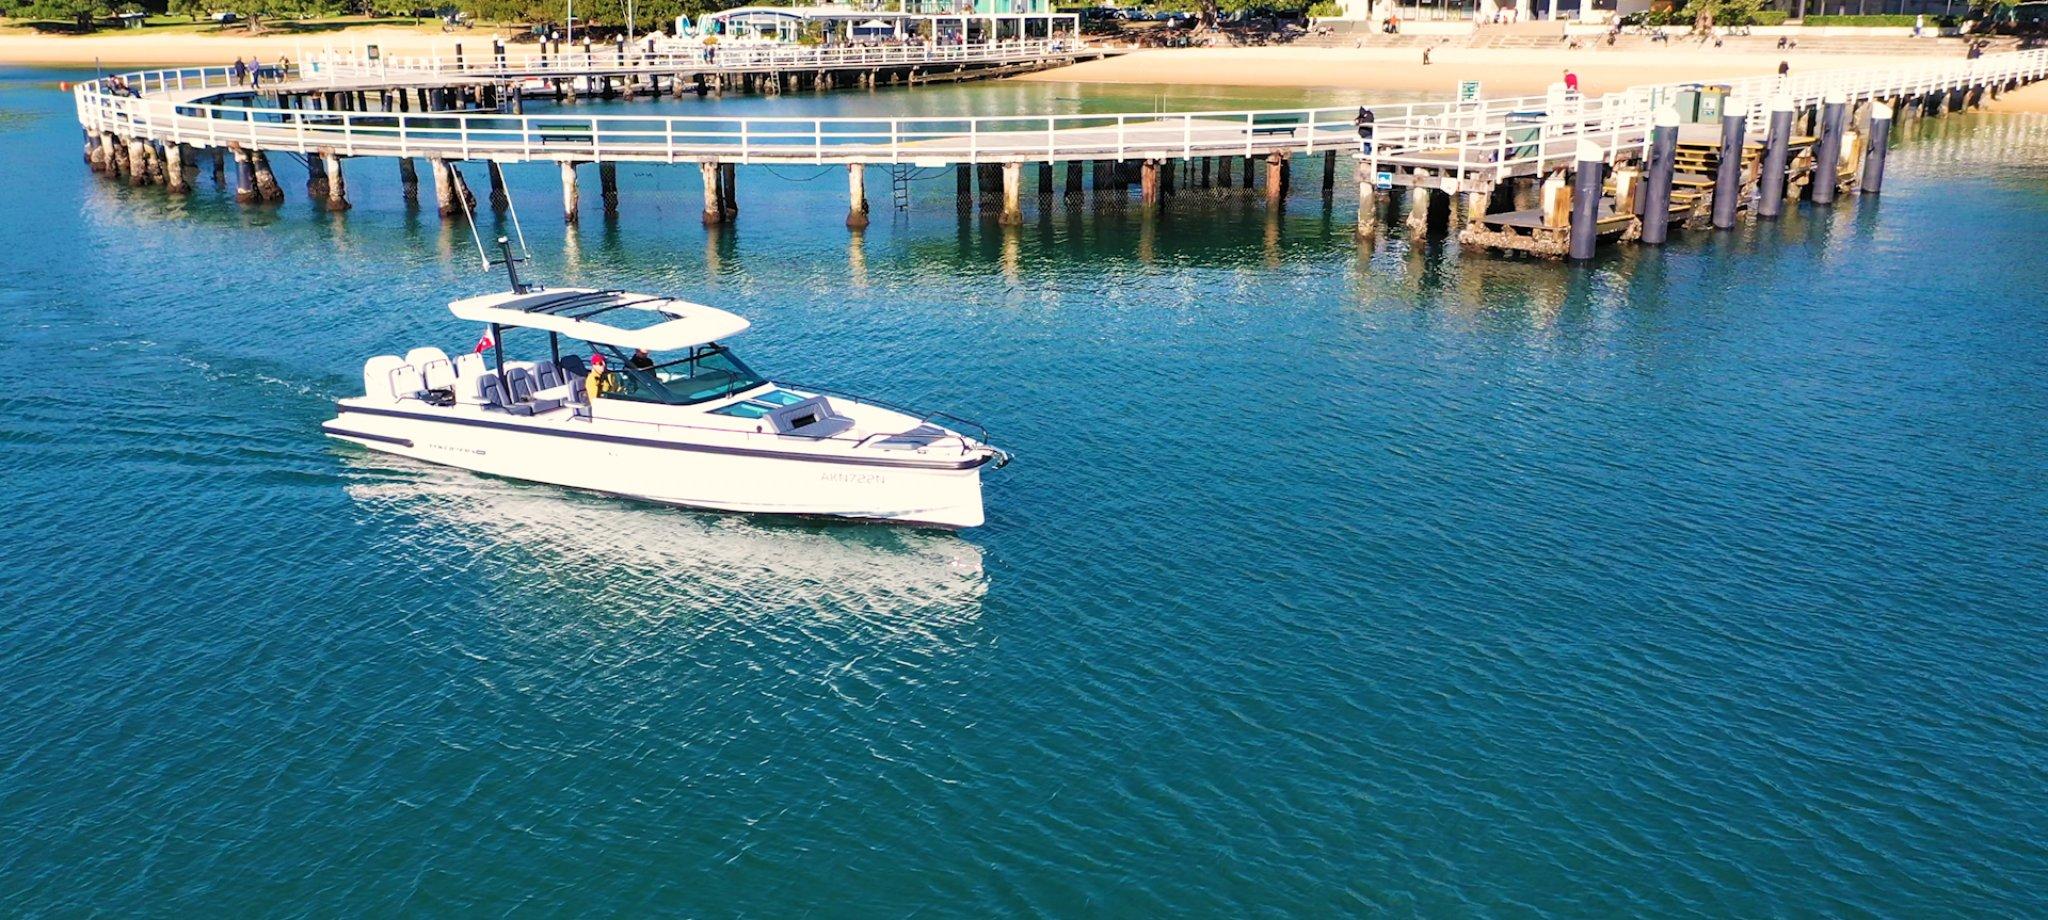 Balmoral Boathouse